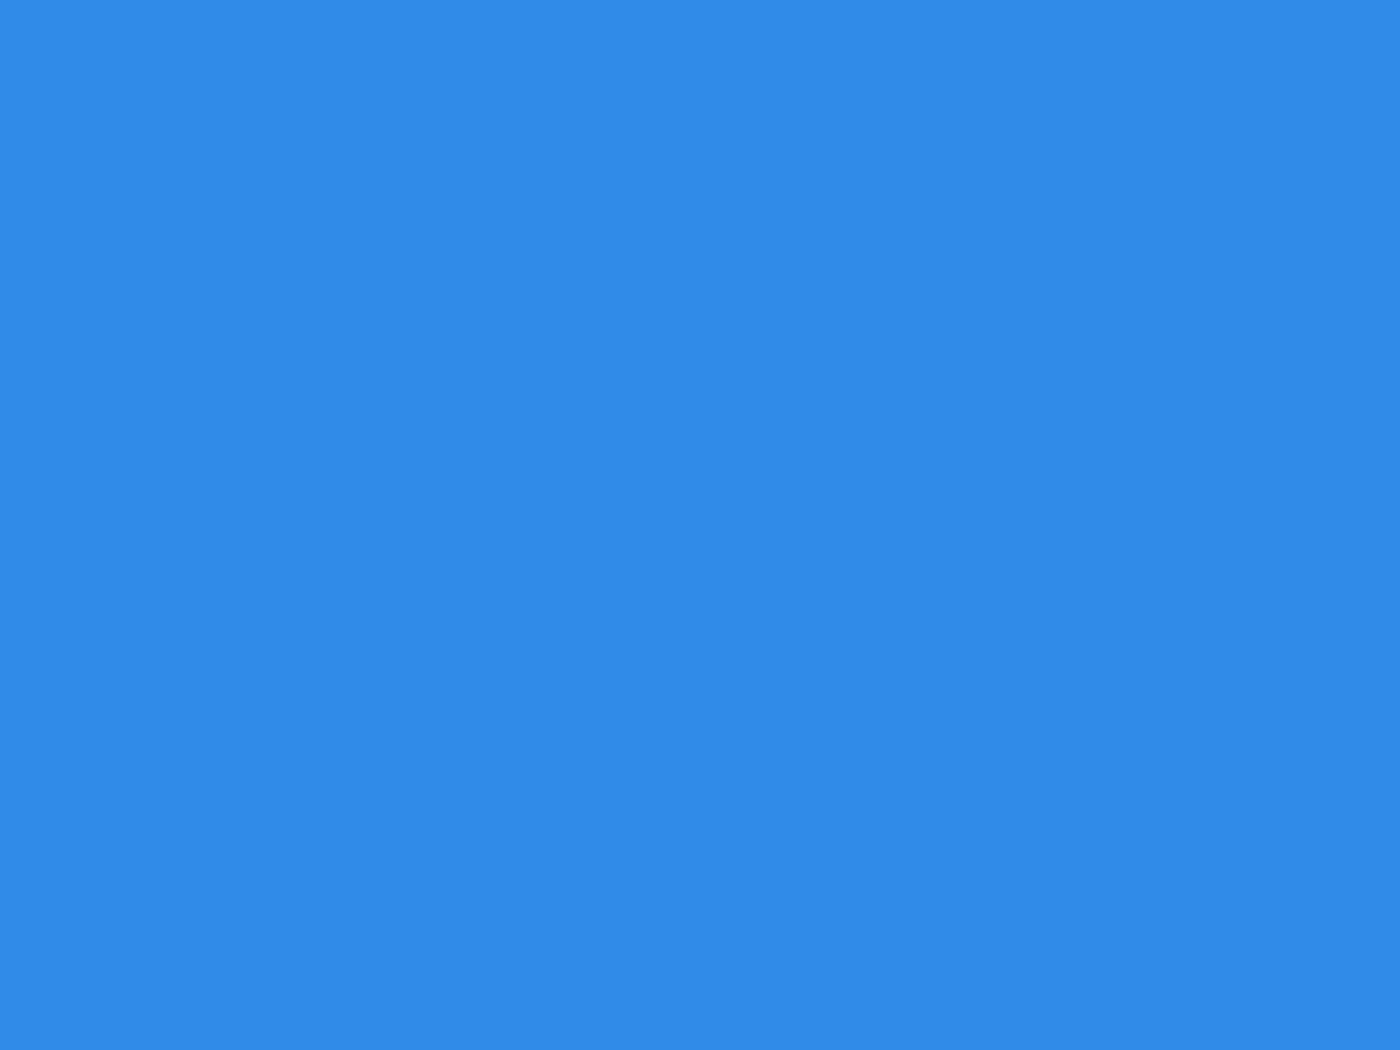 1400x1050 Bleu De France Solid Color Background